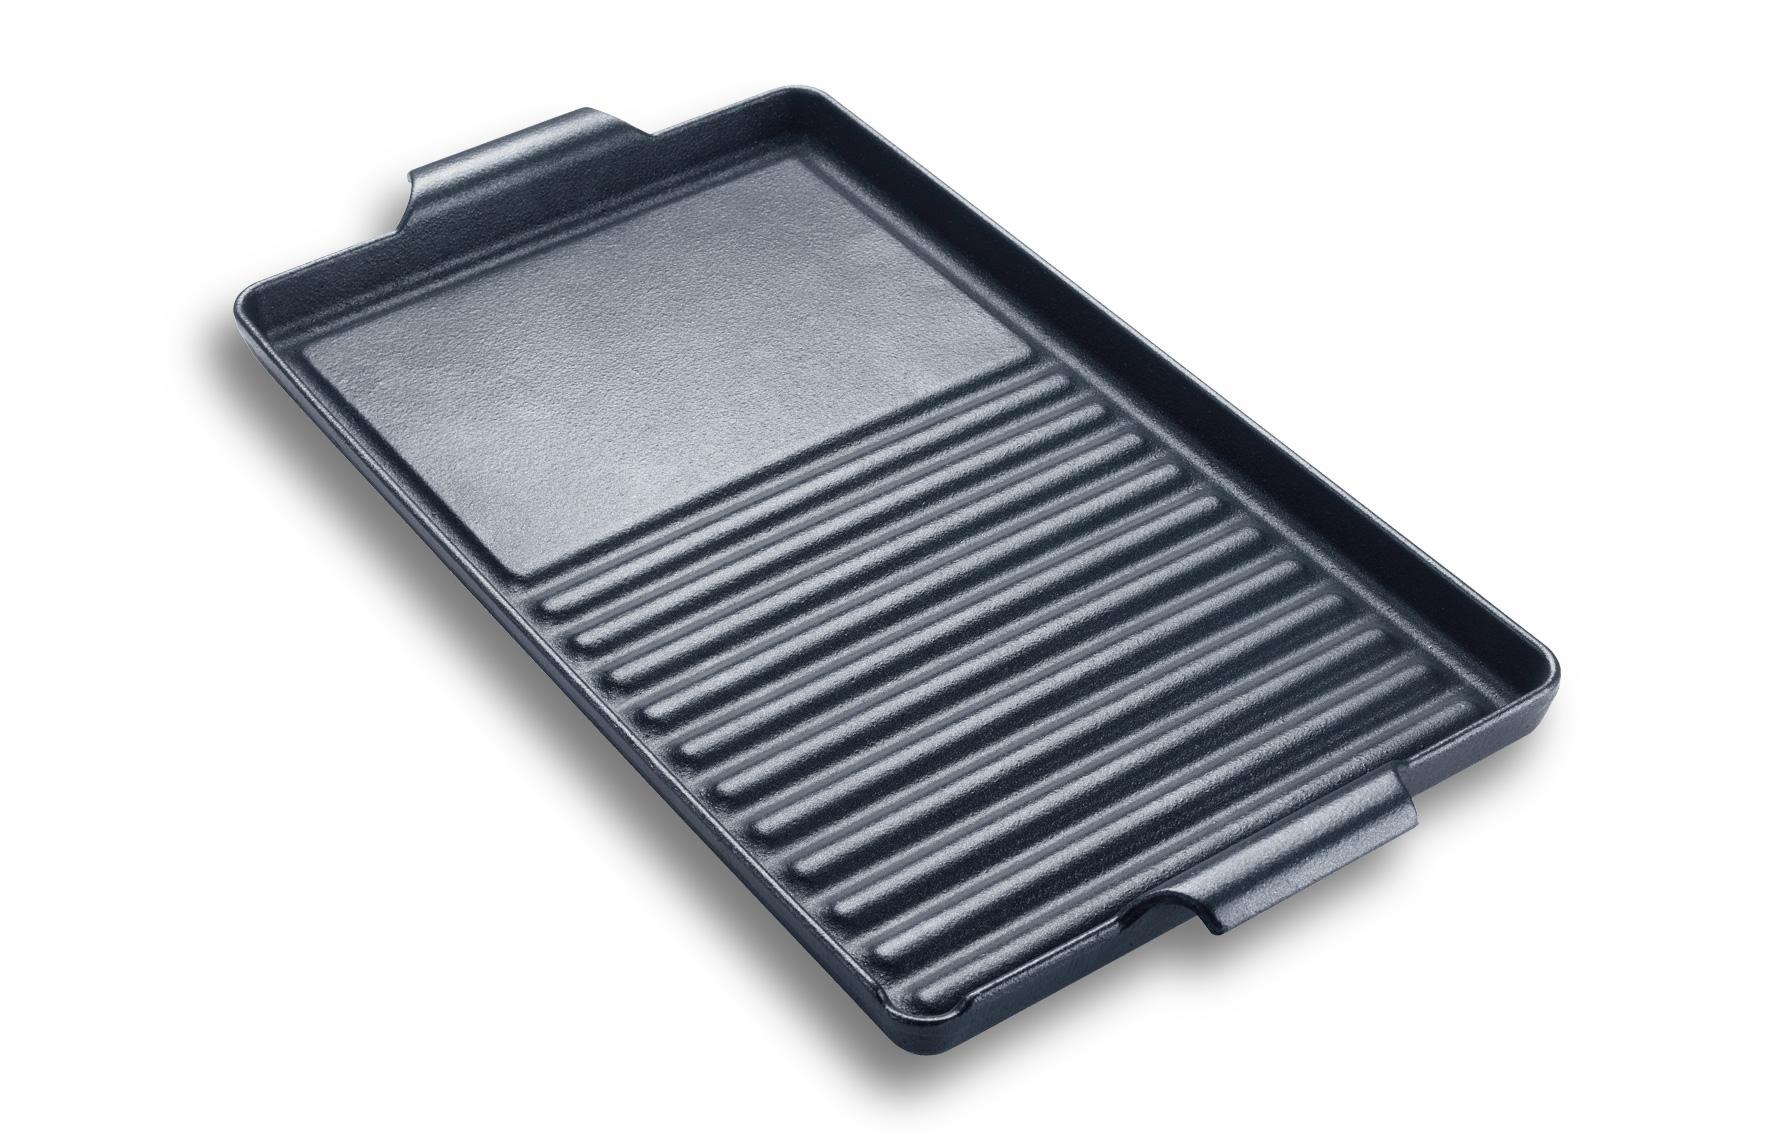 Bertazzoni Griddle Pan Cookware Rangecookers Co Uk